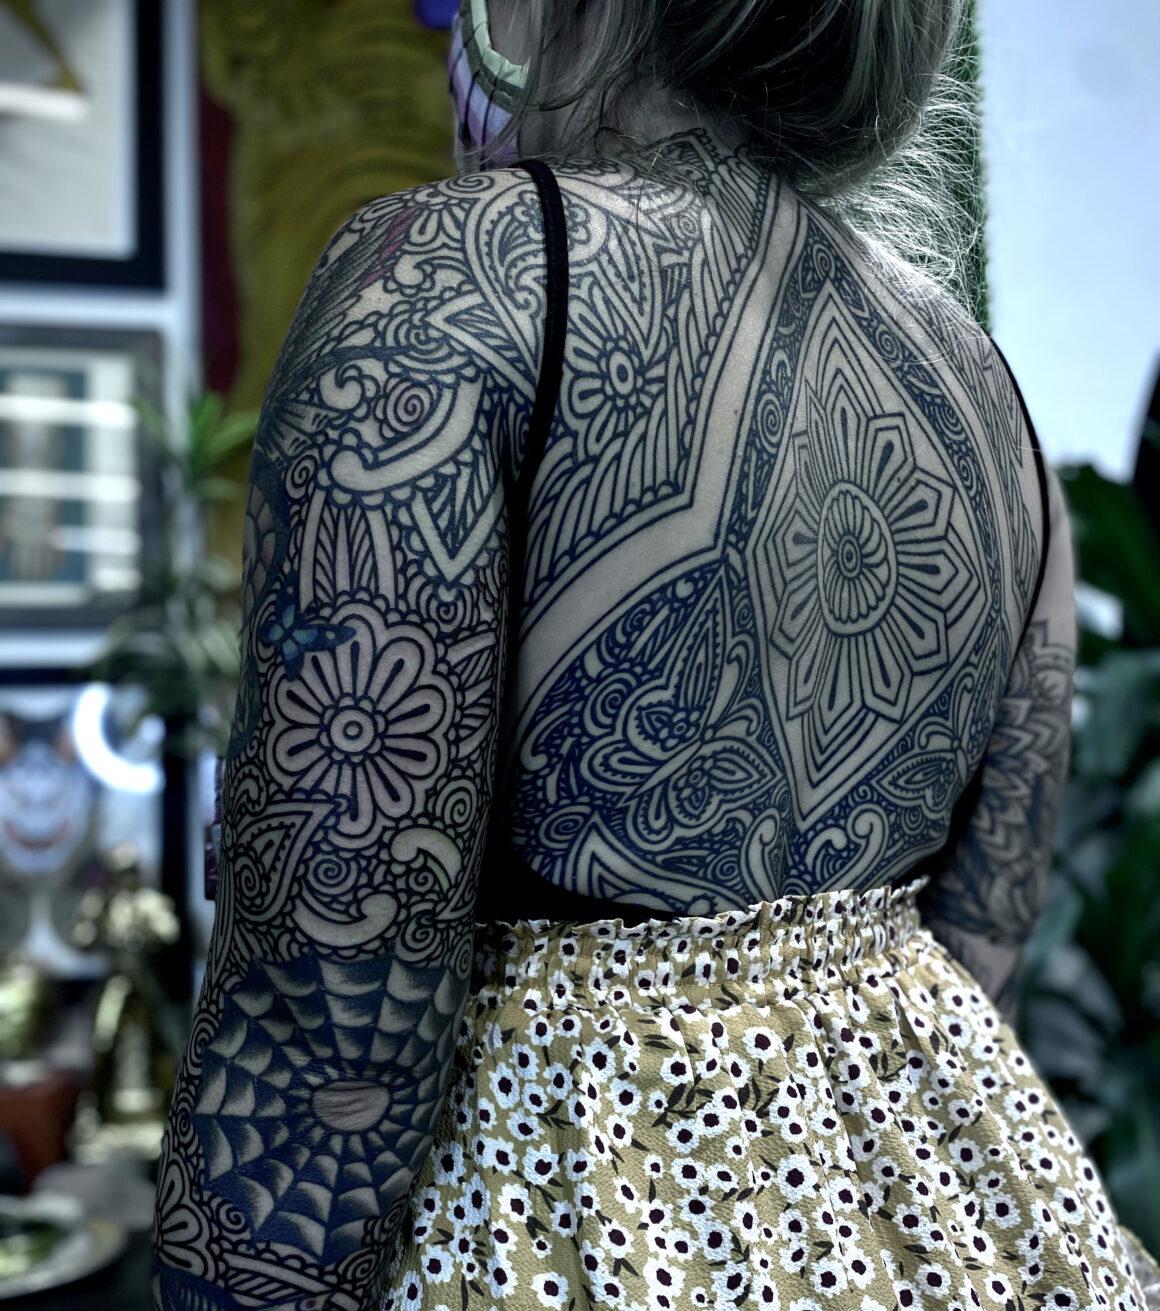 Savannah Colleen, The Tattoo Dojo, Atlanta, GA, USA